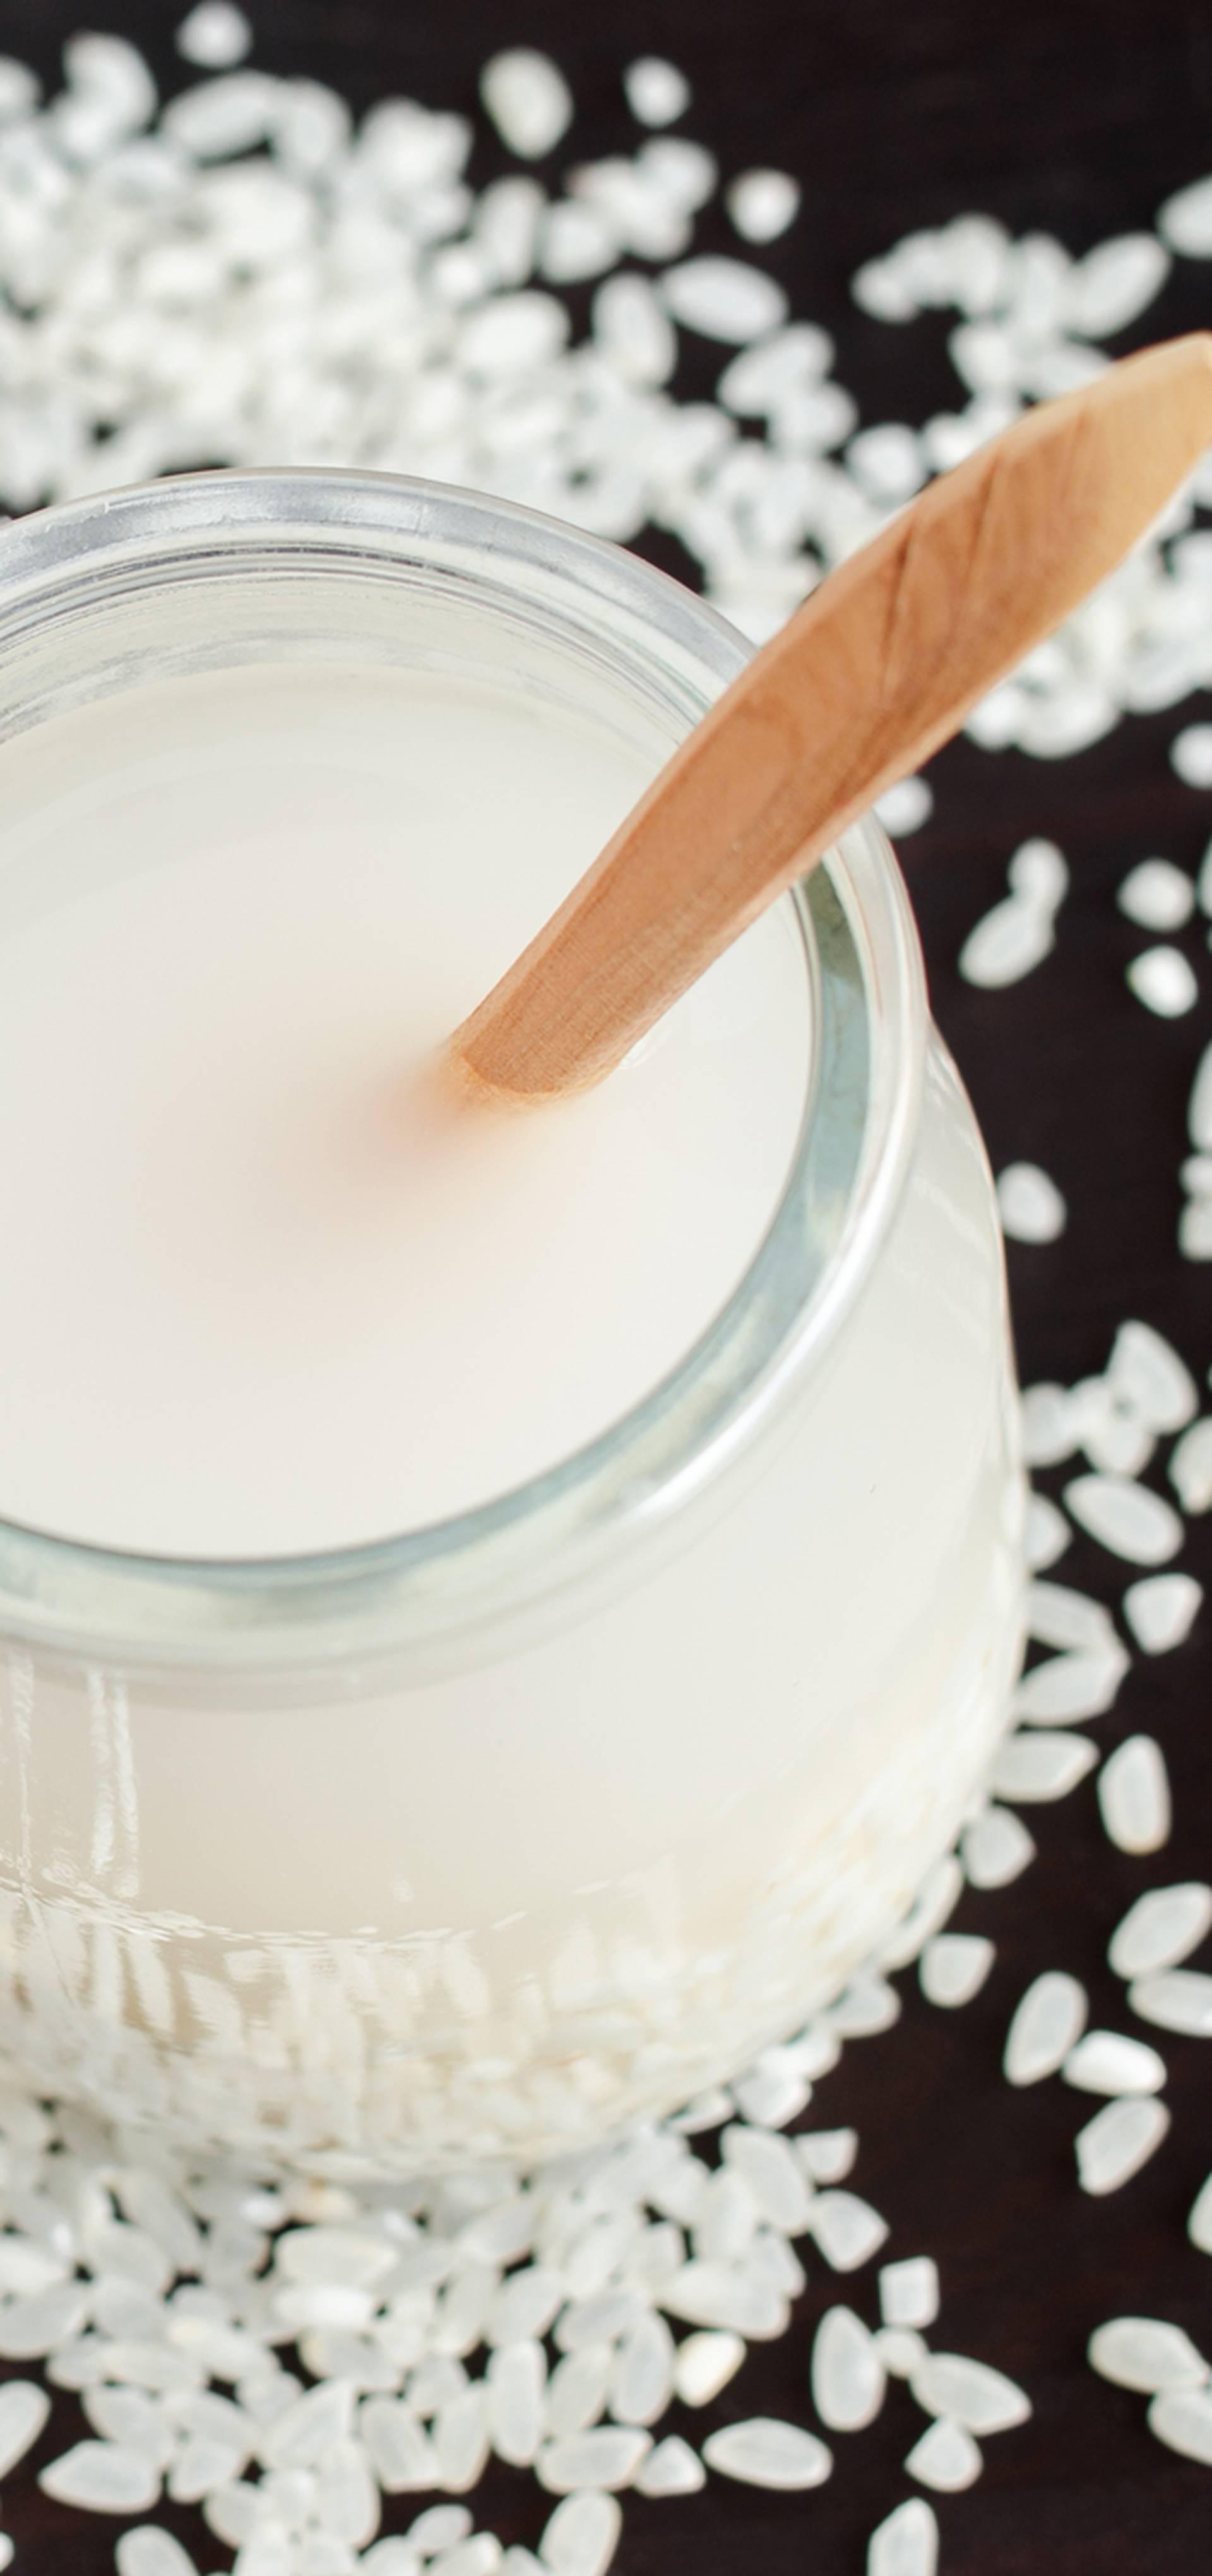 Rižina voda: Instagram hit za obnavljanje oštećene suhe kose